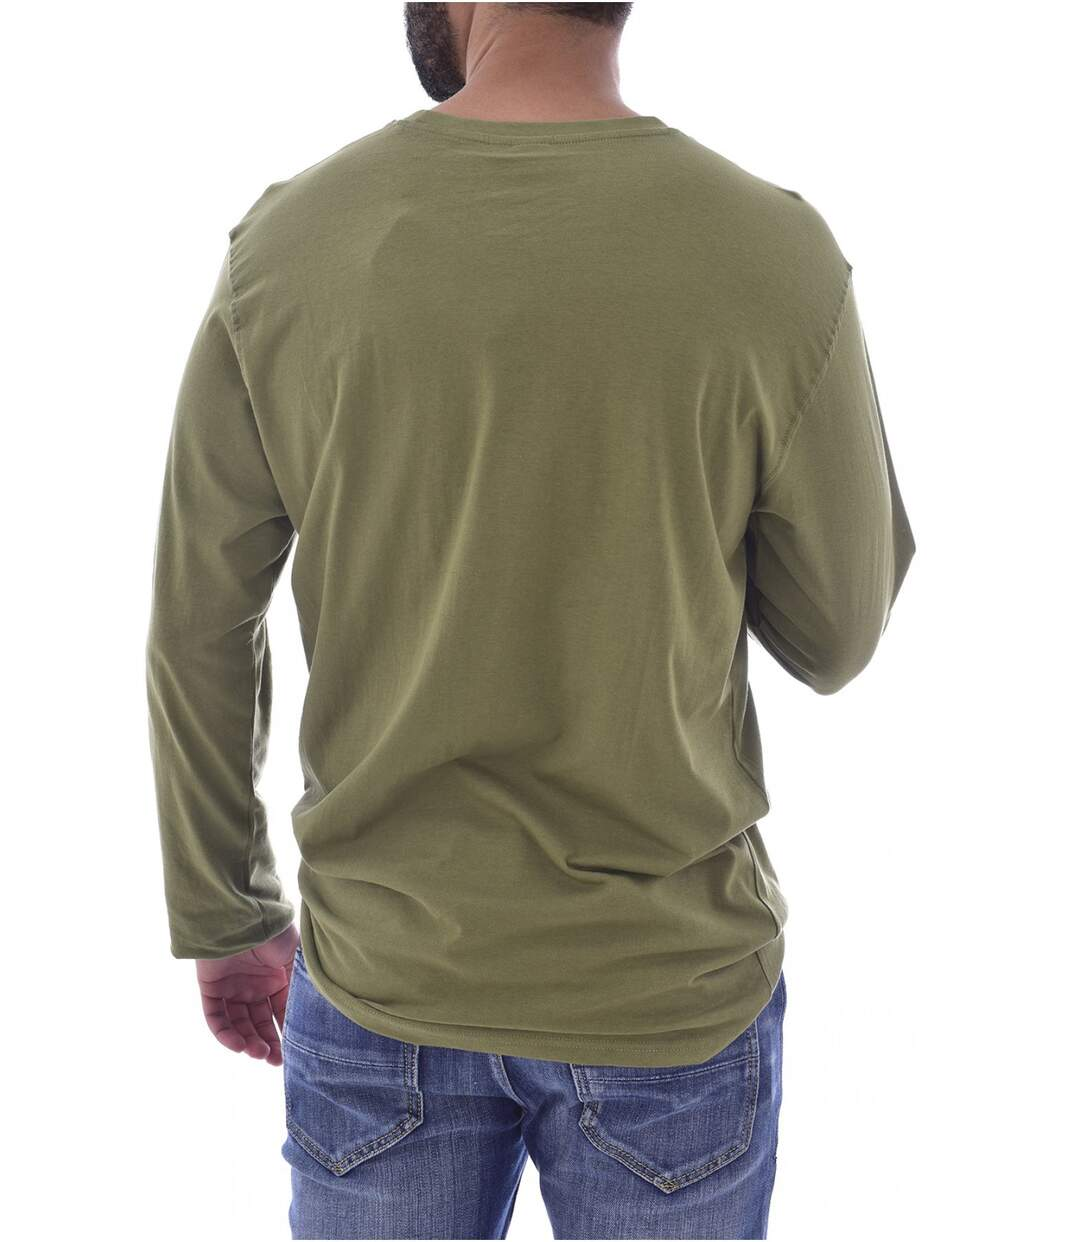 Tee shirt coton à petit logo brodé  -  Sergio tacchini - Homme